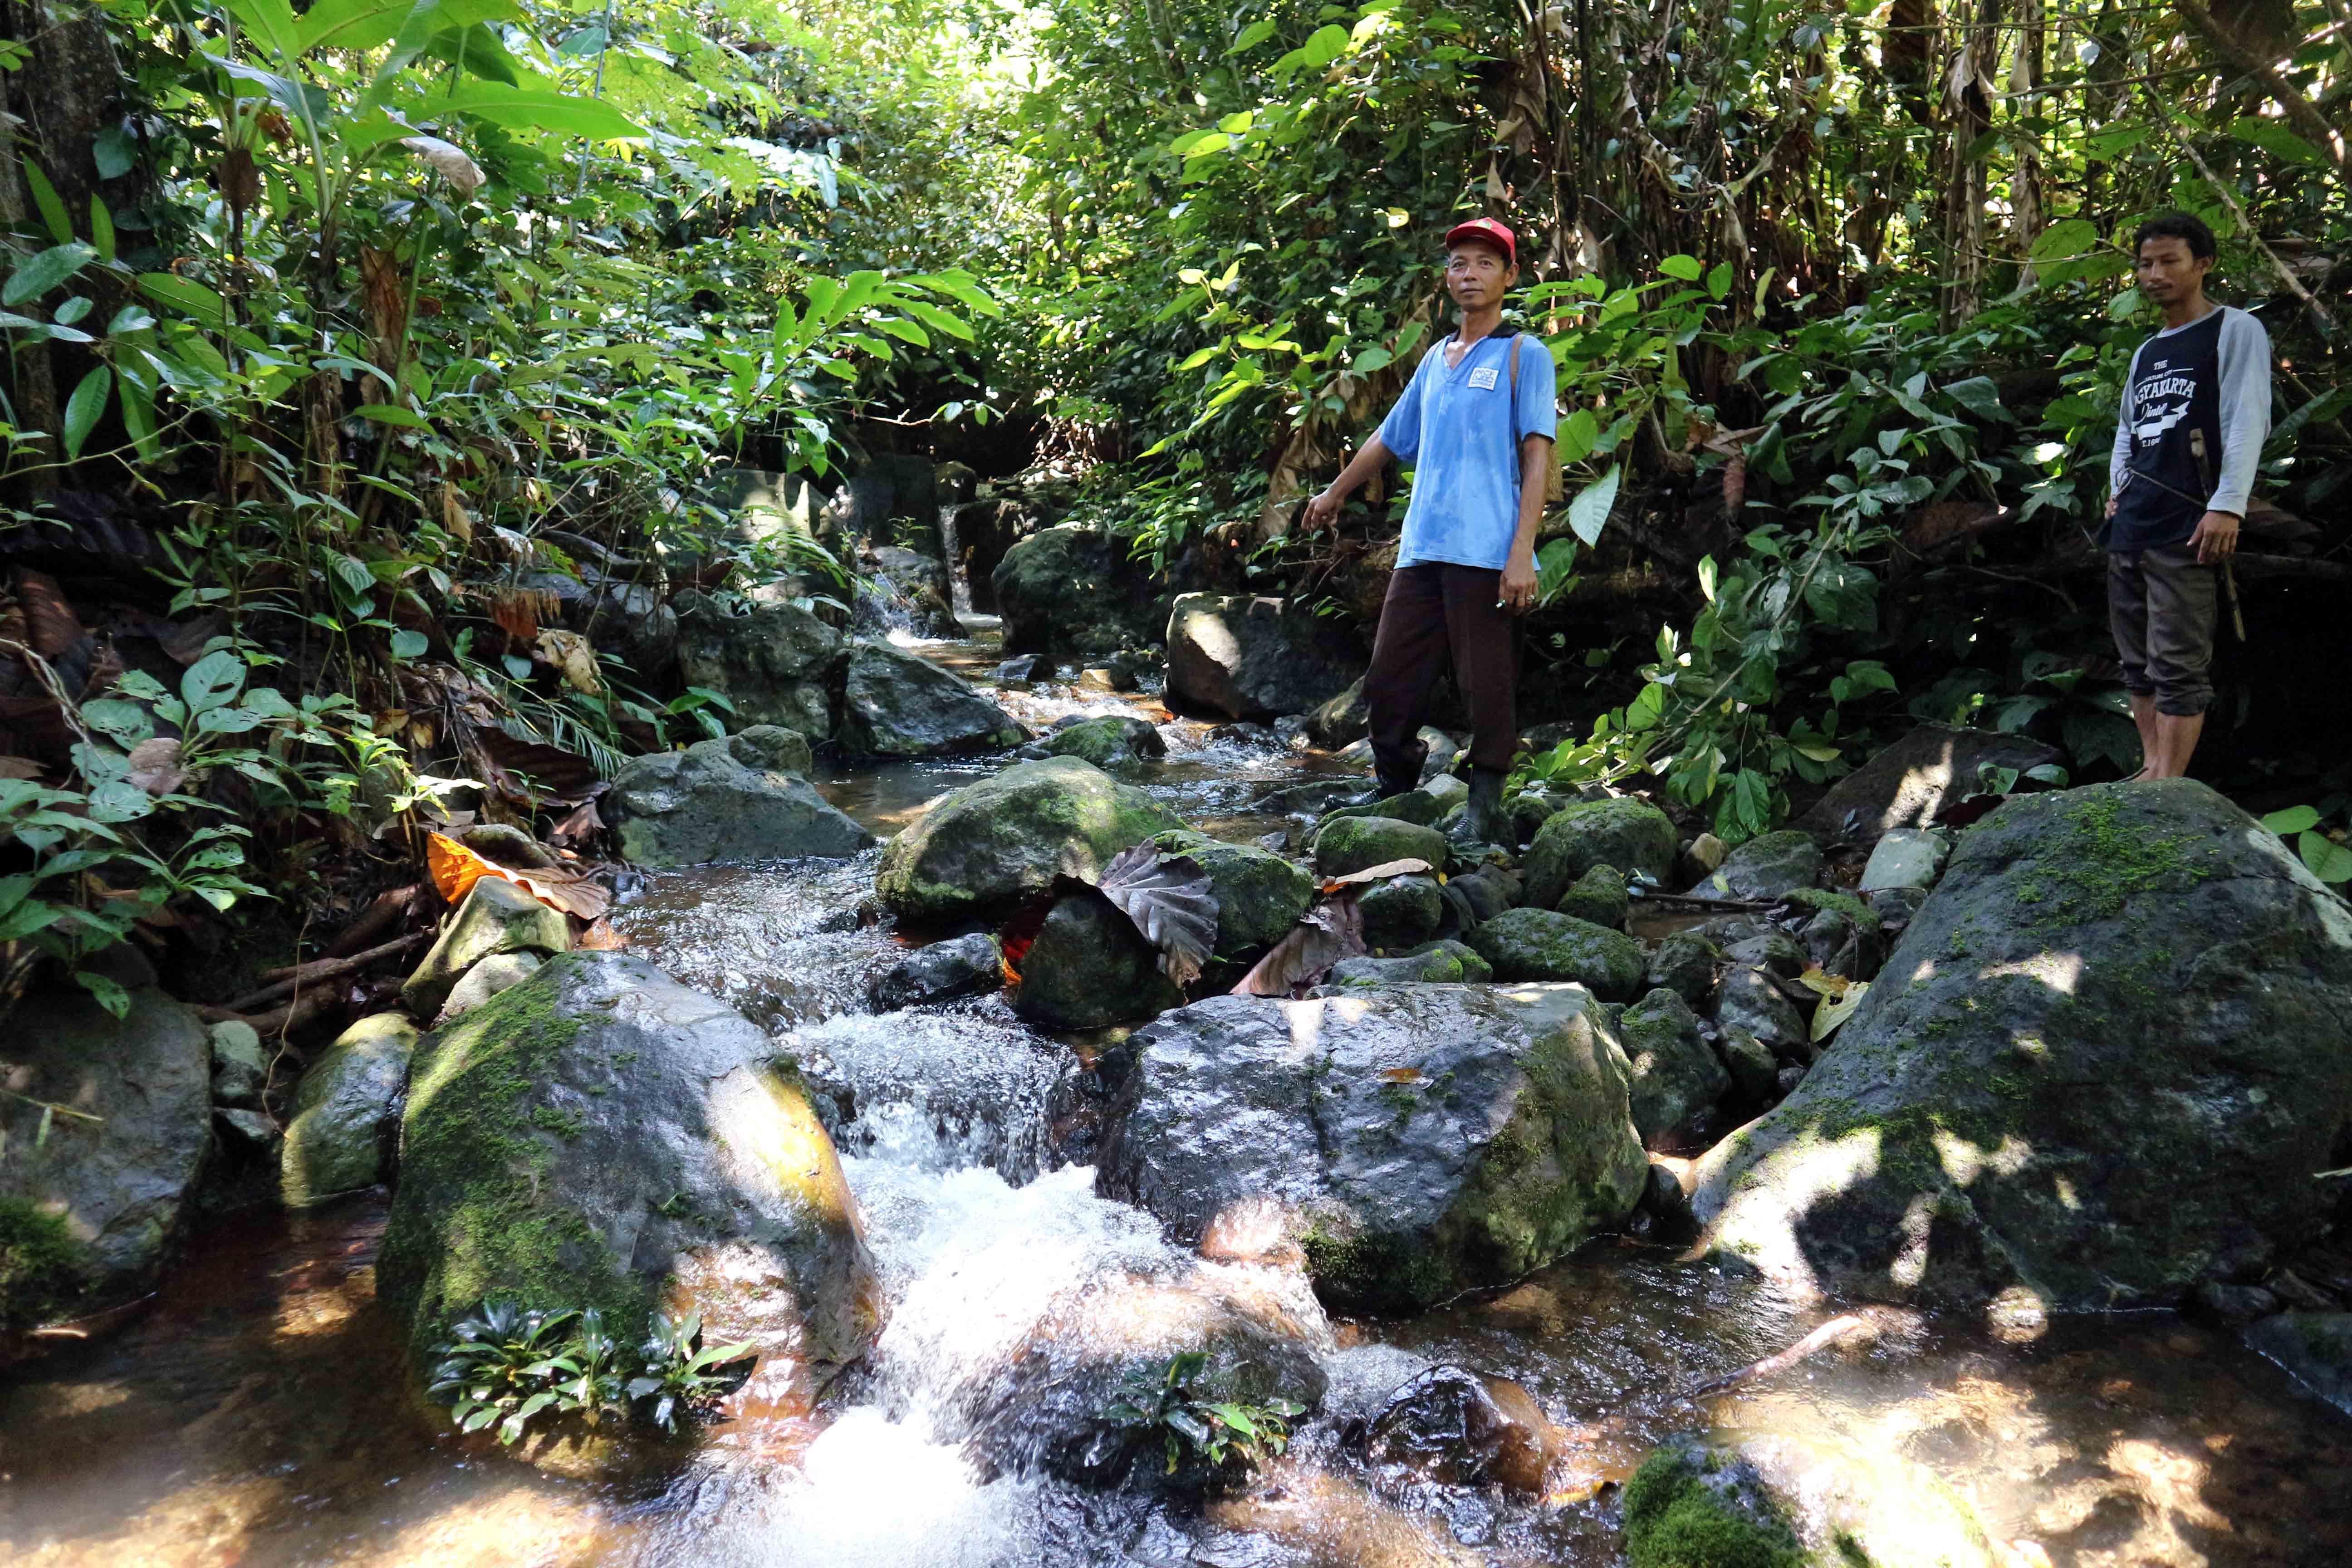 Membangun Industri Air Minum Kemasan dari Kaki Pegunungan Muller